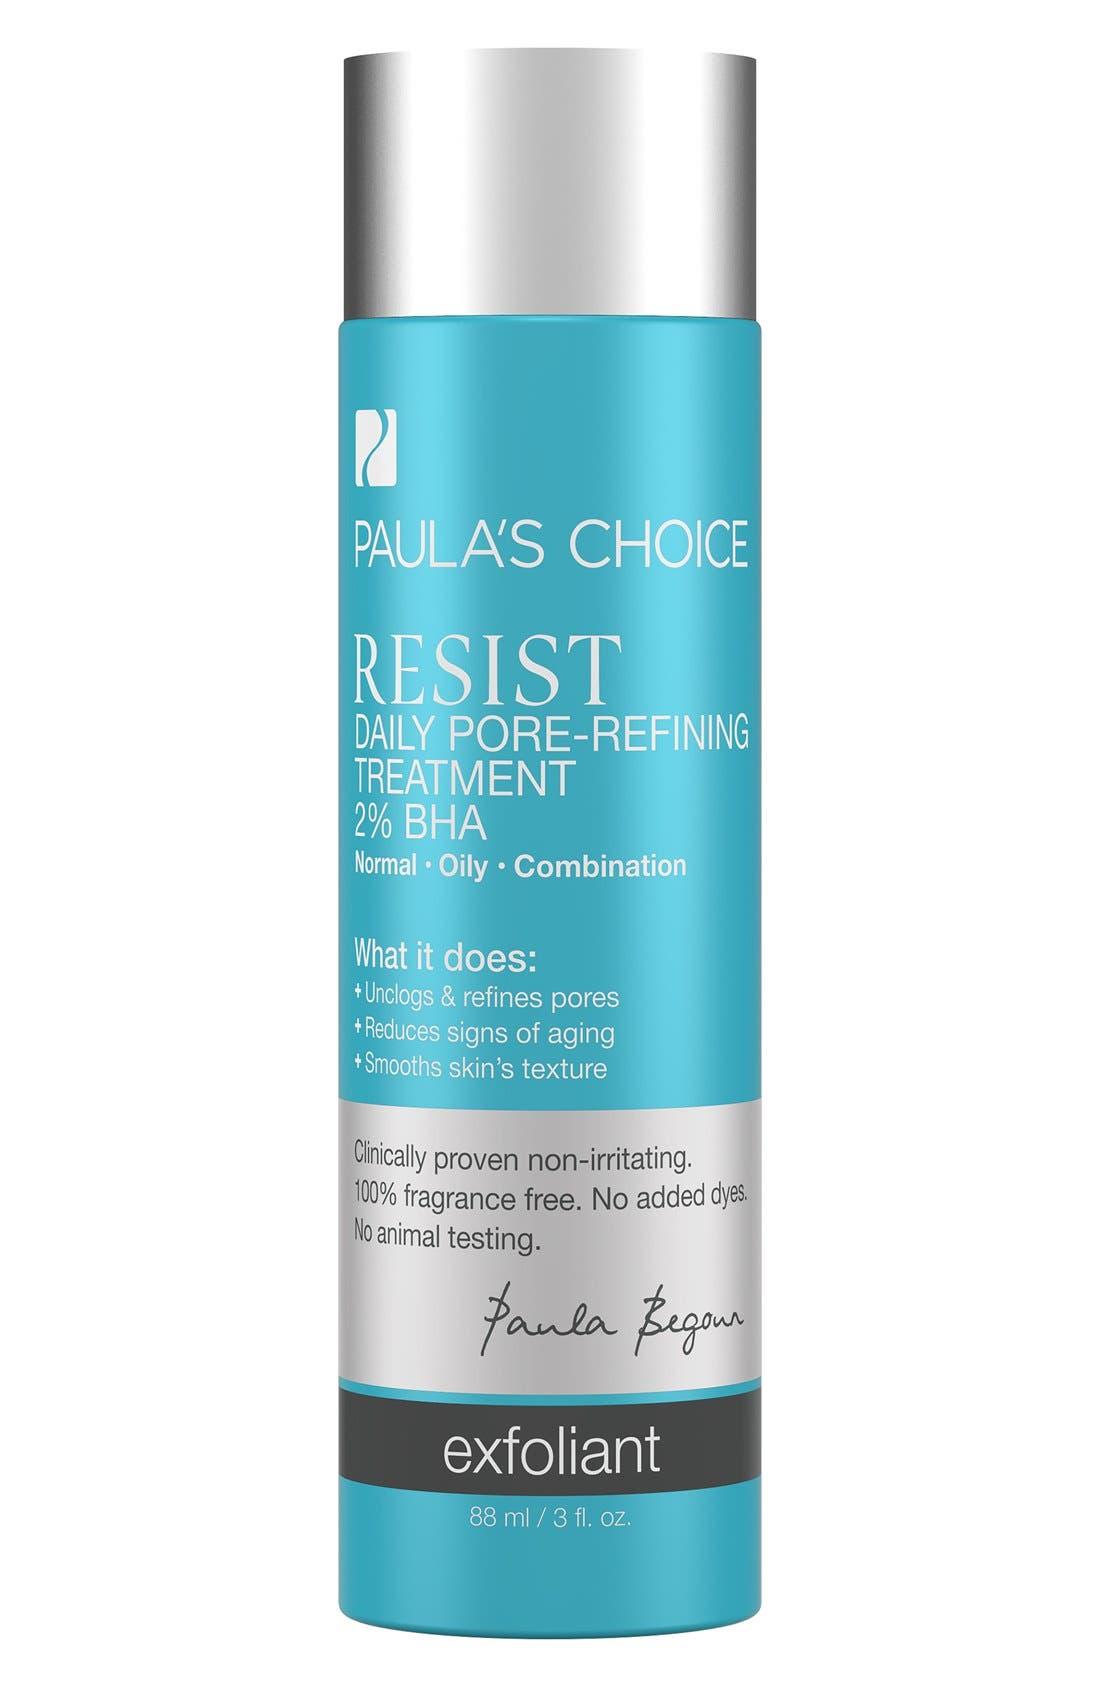 Paula's Choice Resist Daily Pore-Refining Treatment